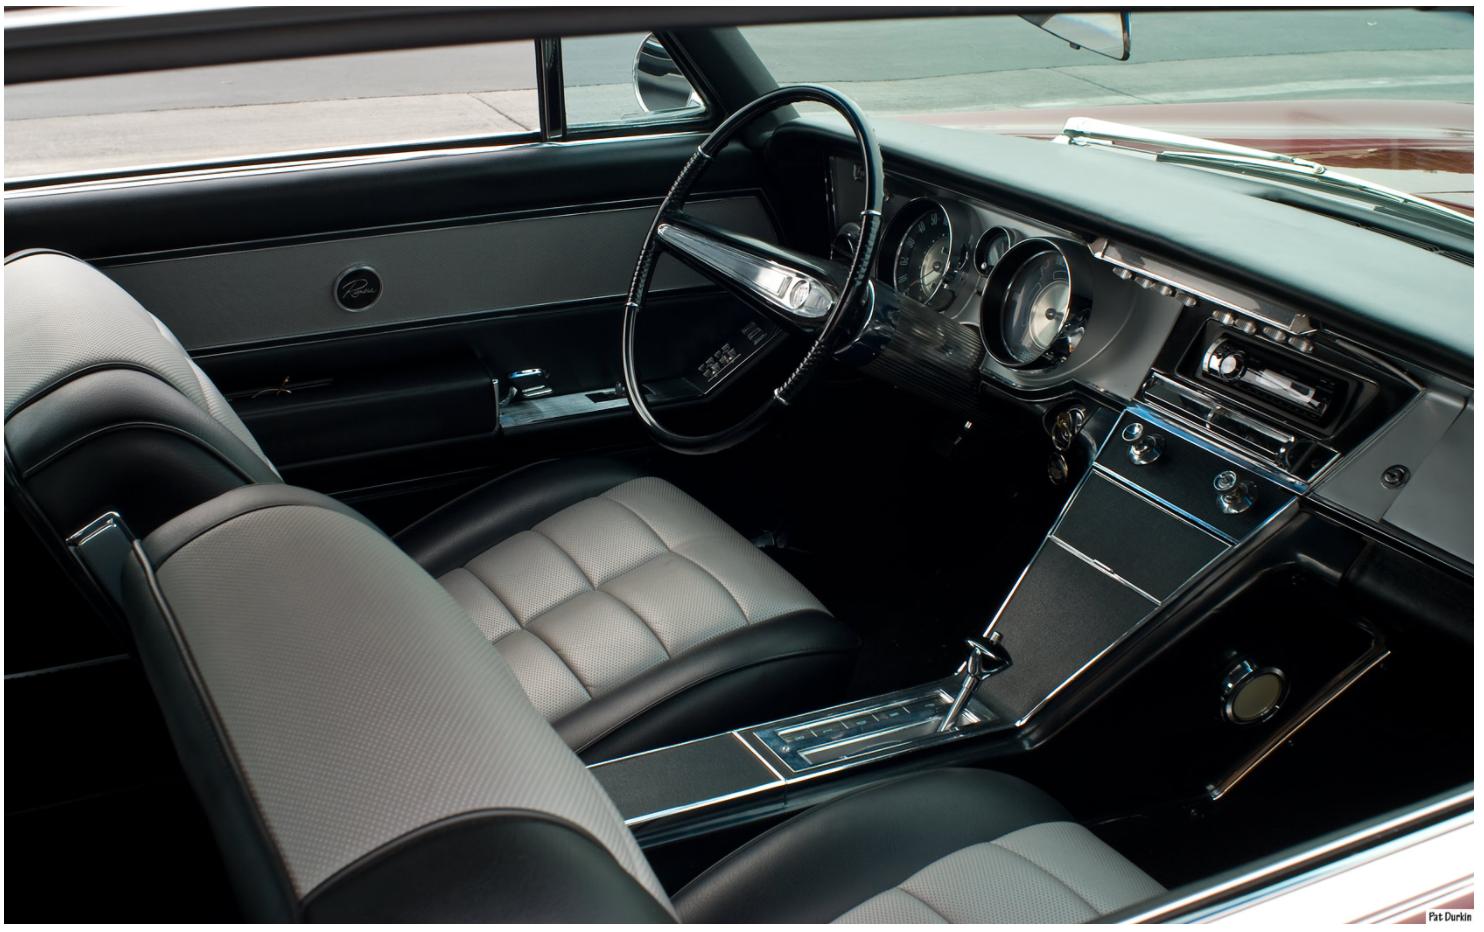 Pin on '69 Buick Riviera